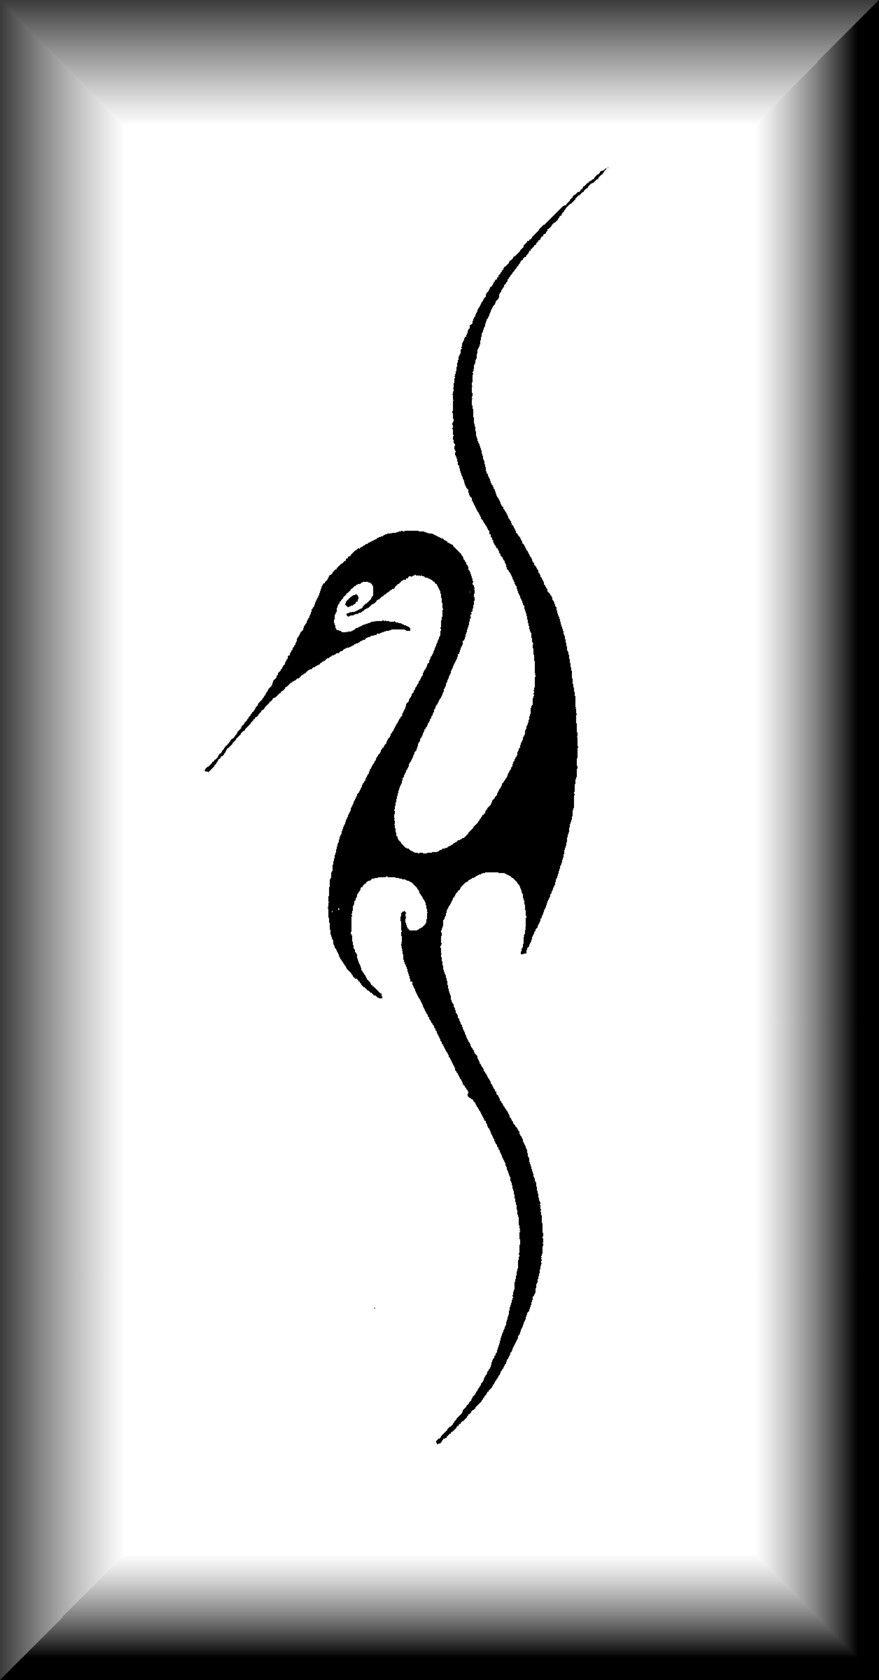 Tribal Heron By Joharasaluki On Deviantart Heron Tattoo Bird Silhouette Art Tribal